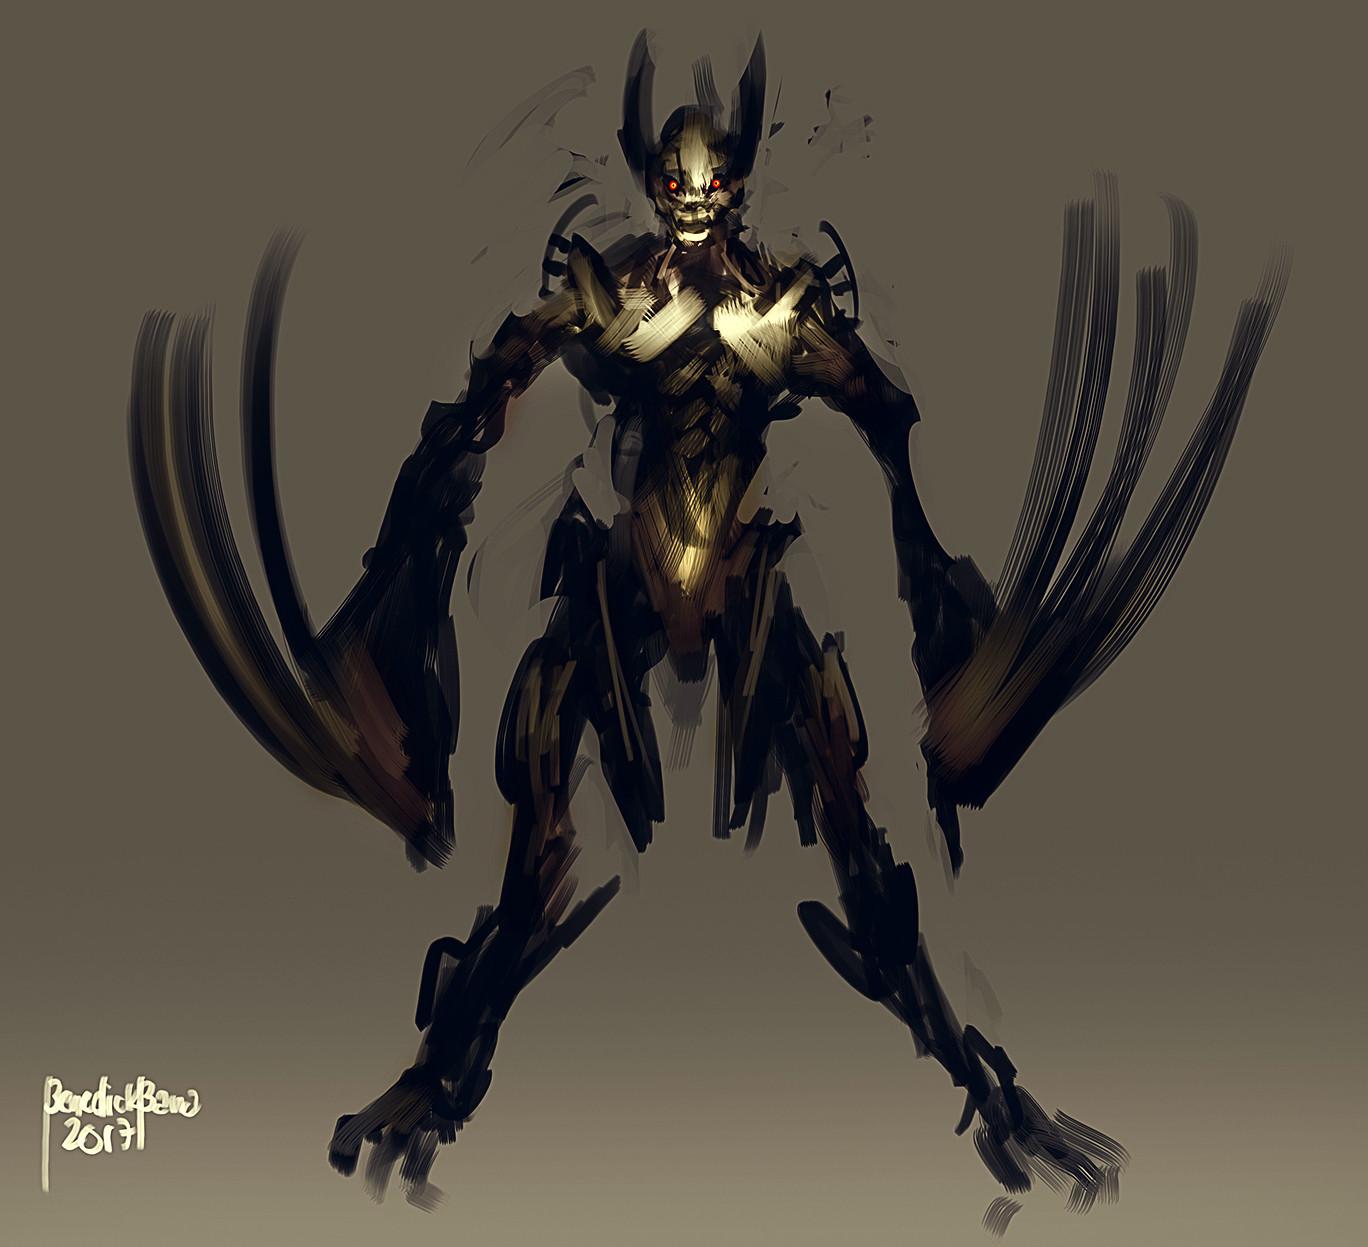 Benedick bana creature design 001 lores